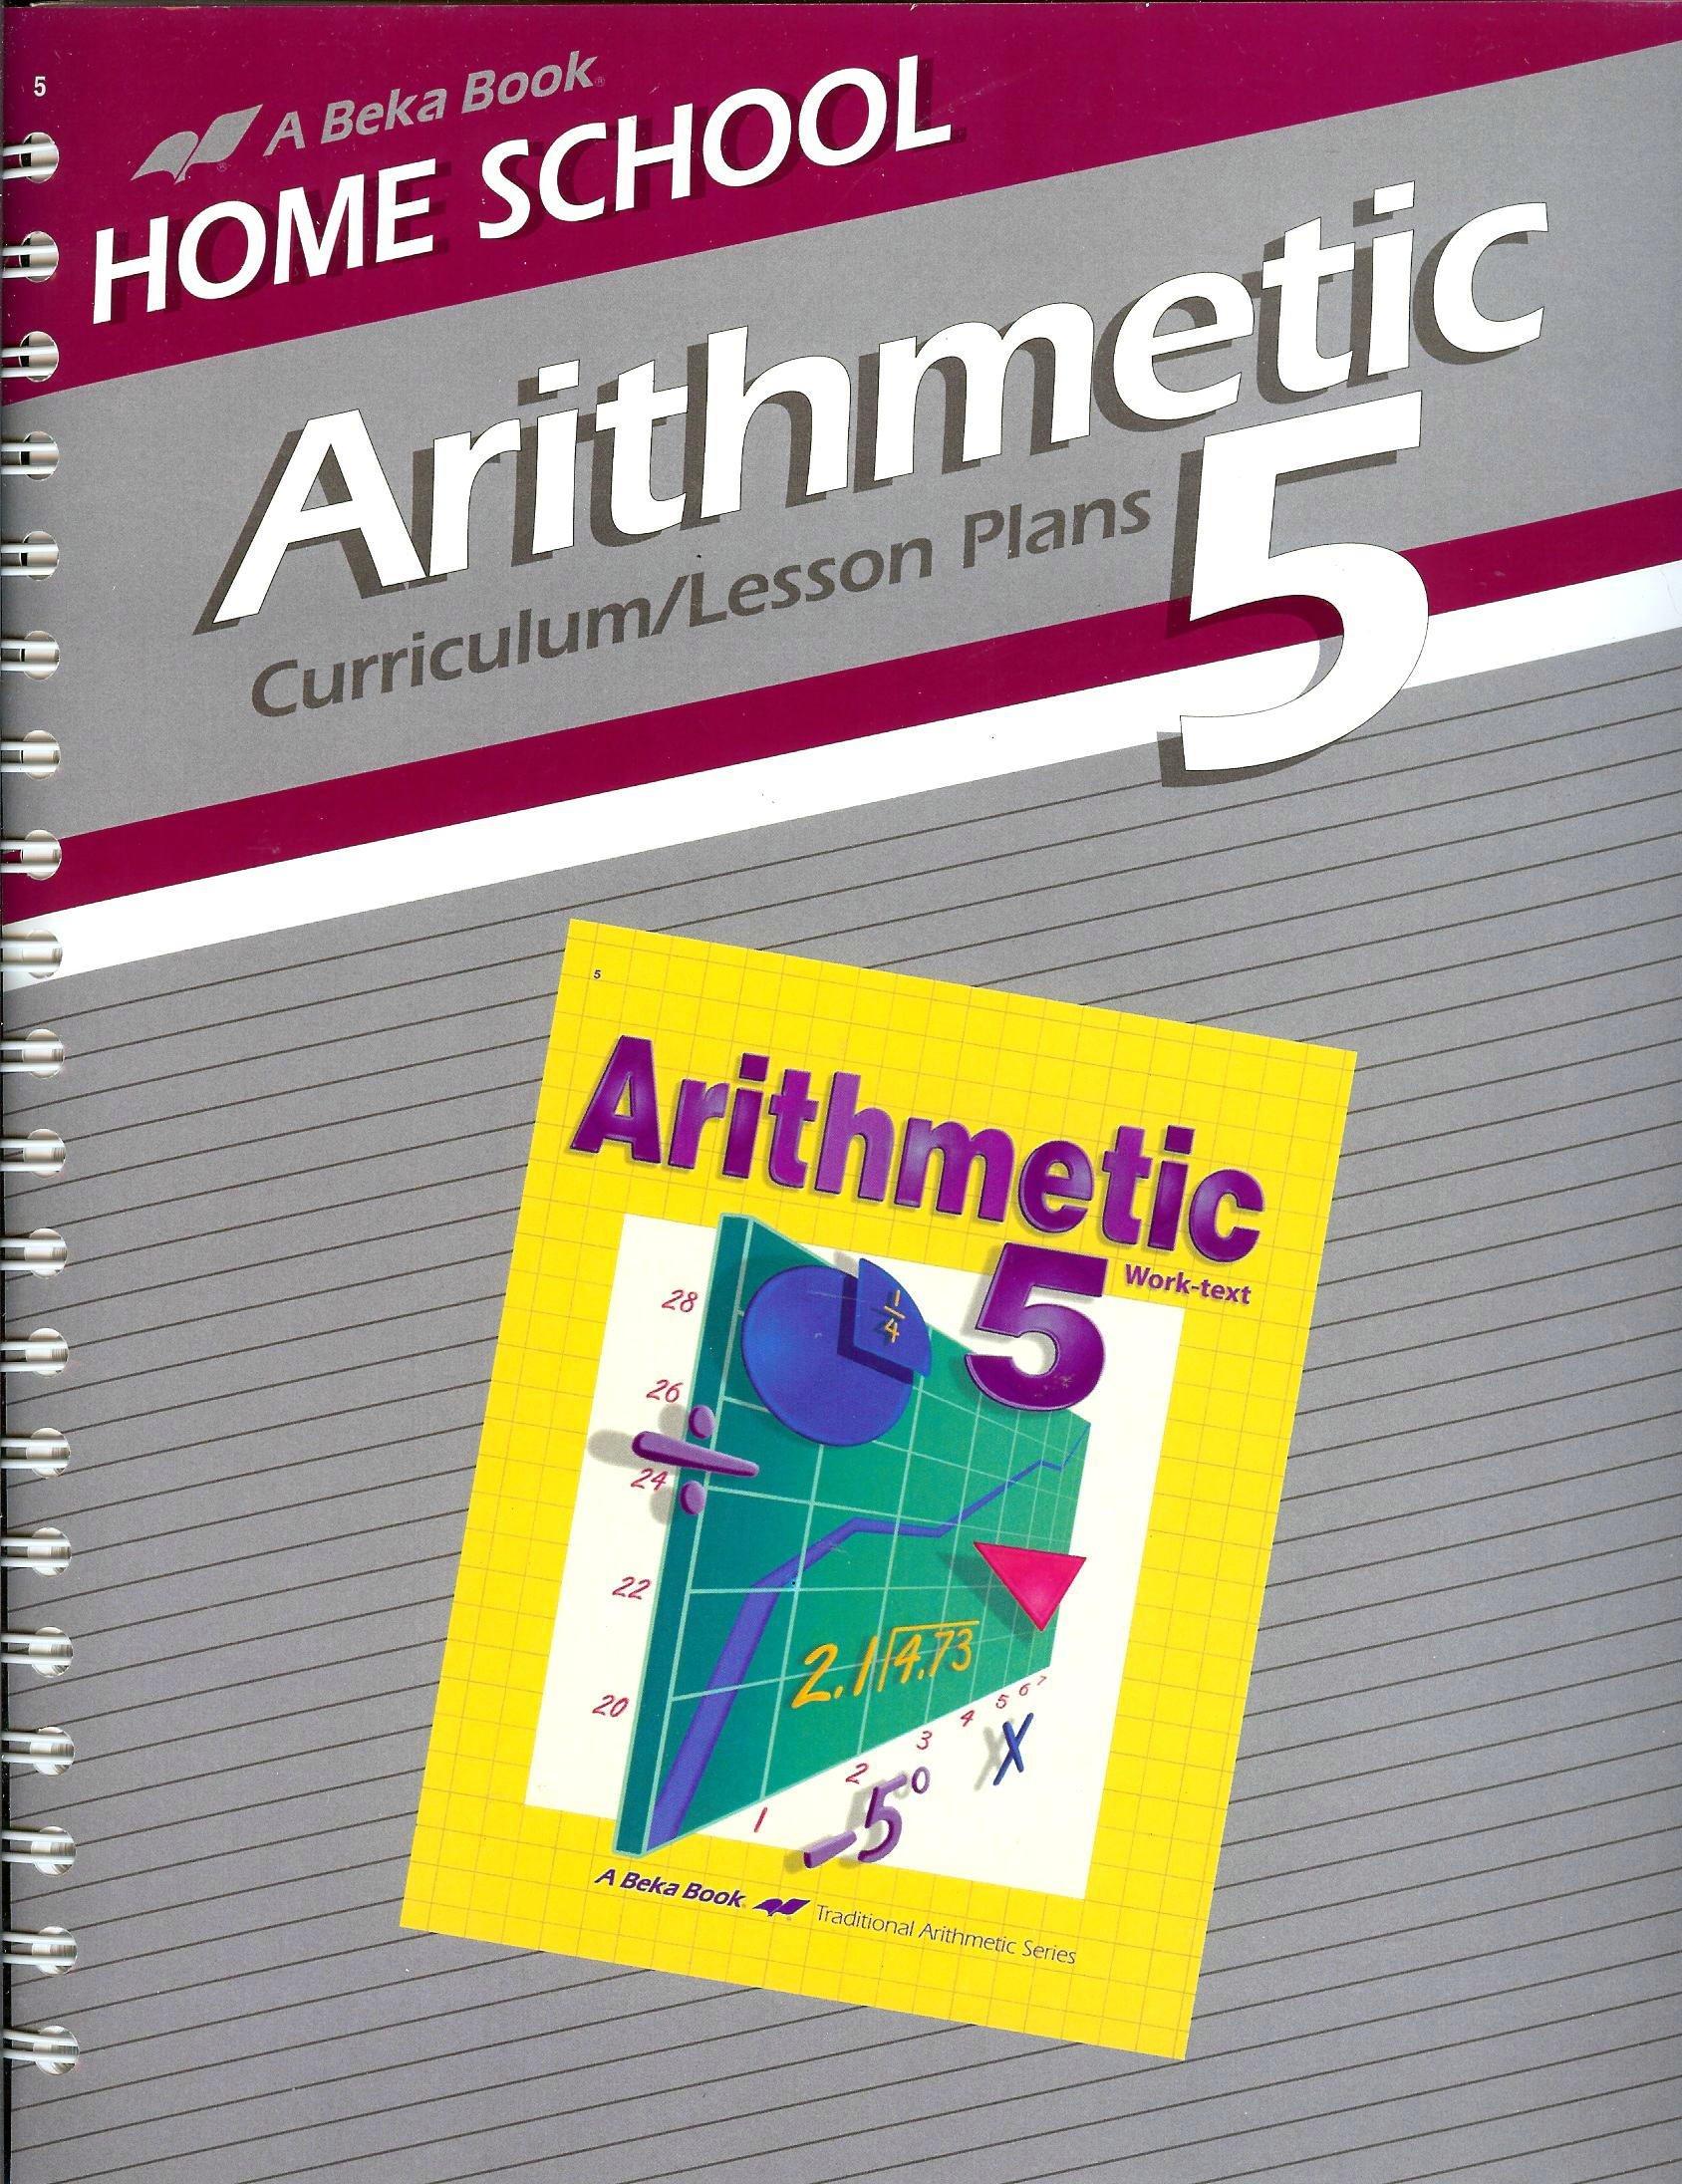 Download A Beka Book Home School Arithmetic 5 Curriculum/Lesson Plans PDF